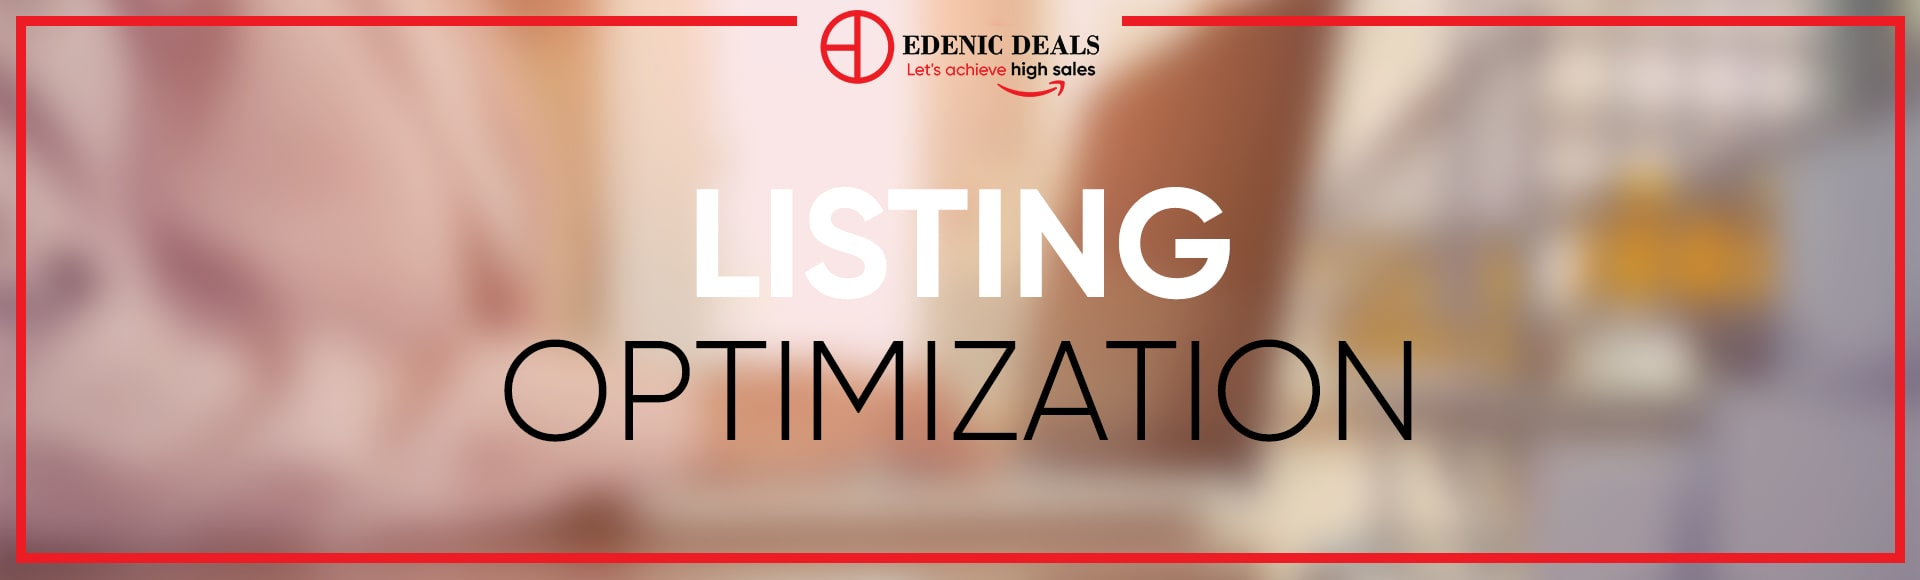 Edenic Deals Listing Optimization